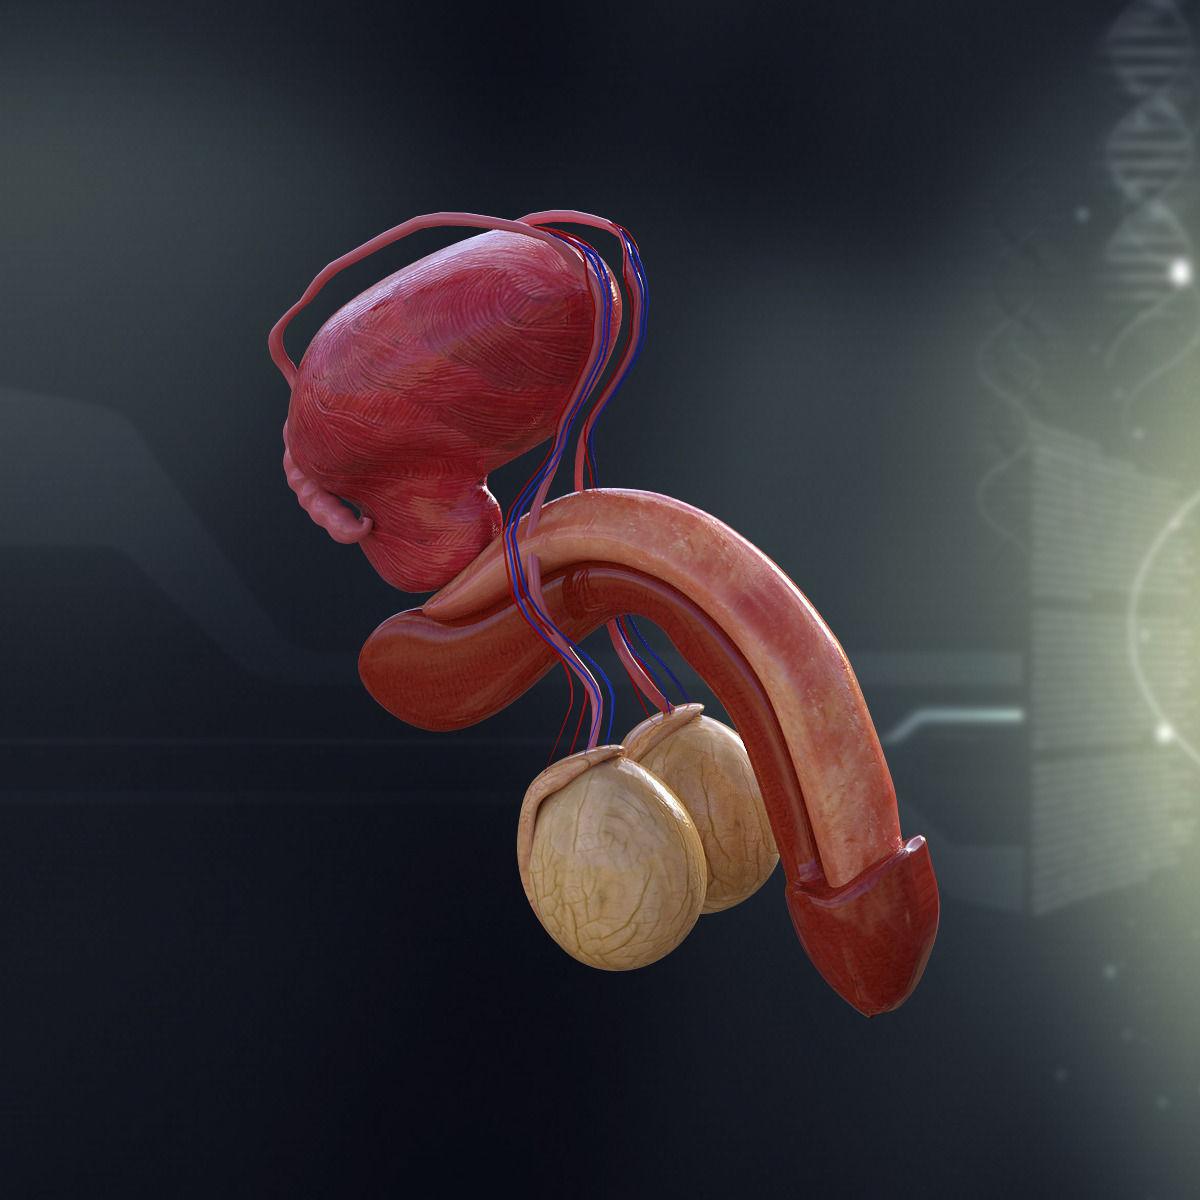 Human Male Organ Anatomy 3d Model X Obj 3ds Fbx C4d Lwo Lw Lws